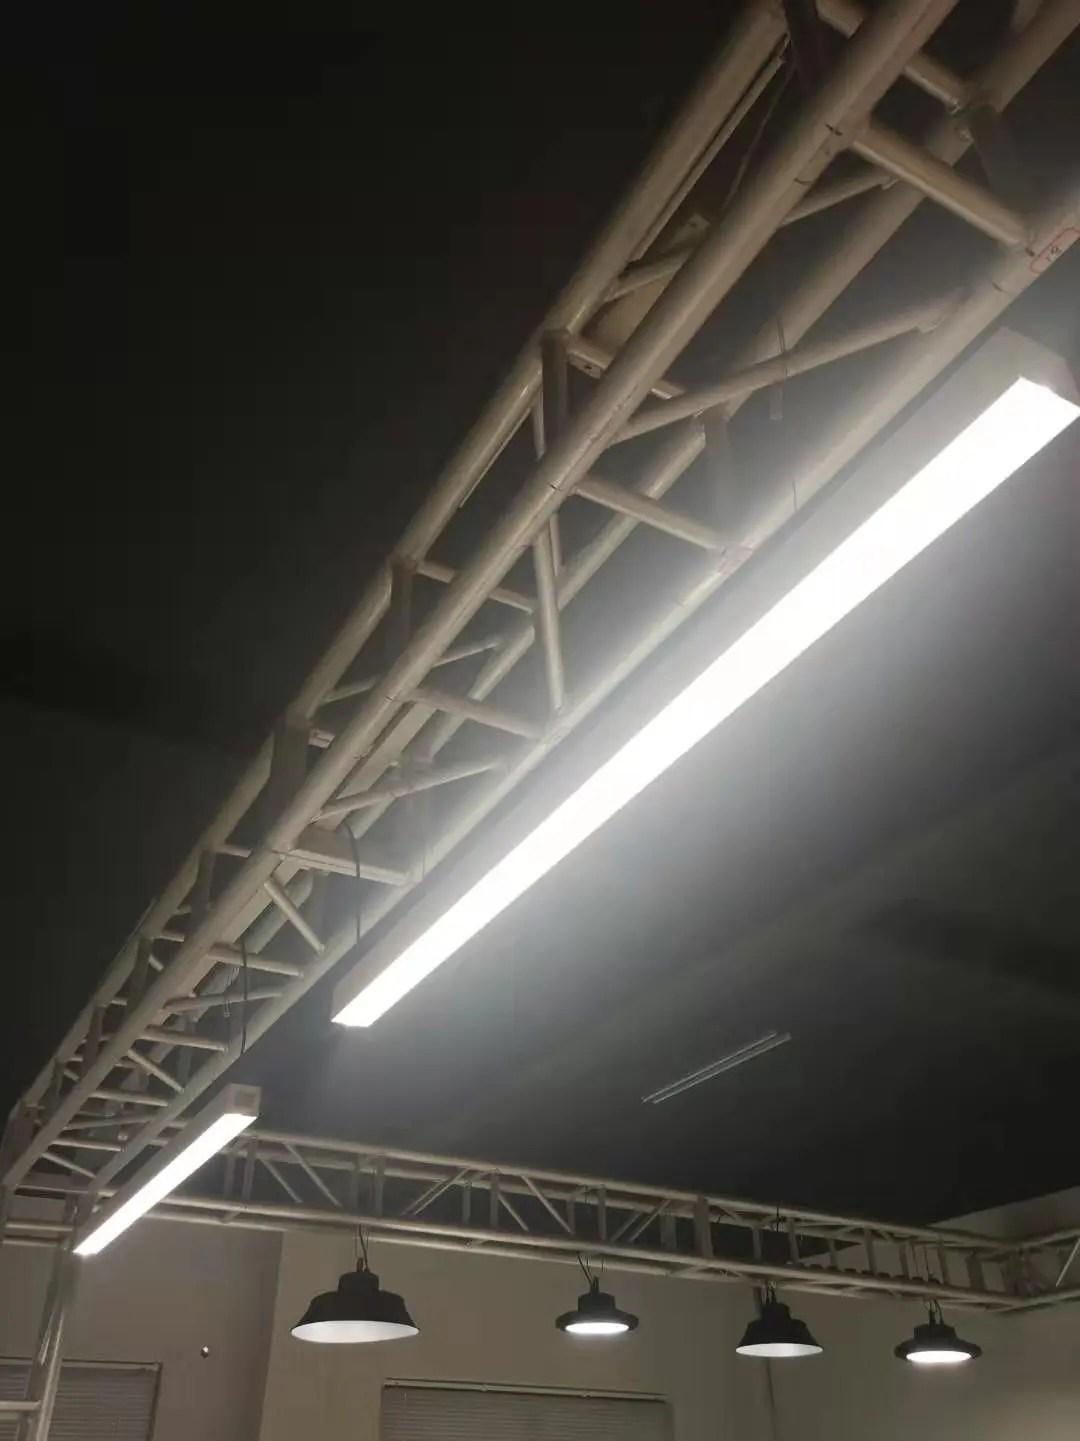 led linear light fixture architectural suspended channel light linkable 4ft 36w office lighting buy rope lamp custom lighting led linear pendant